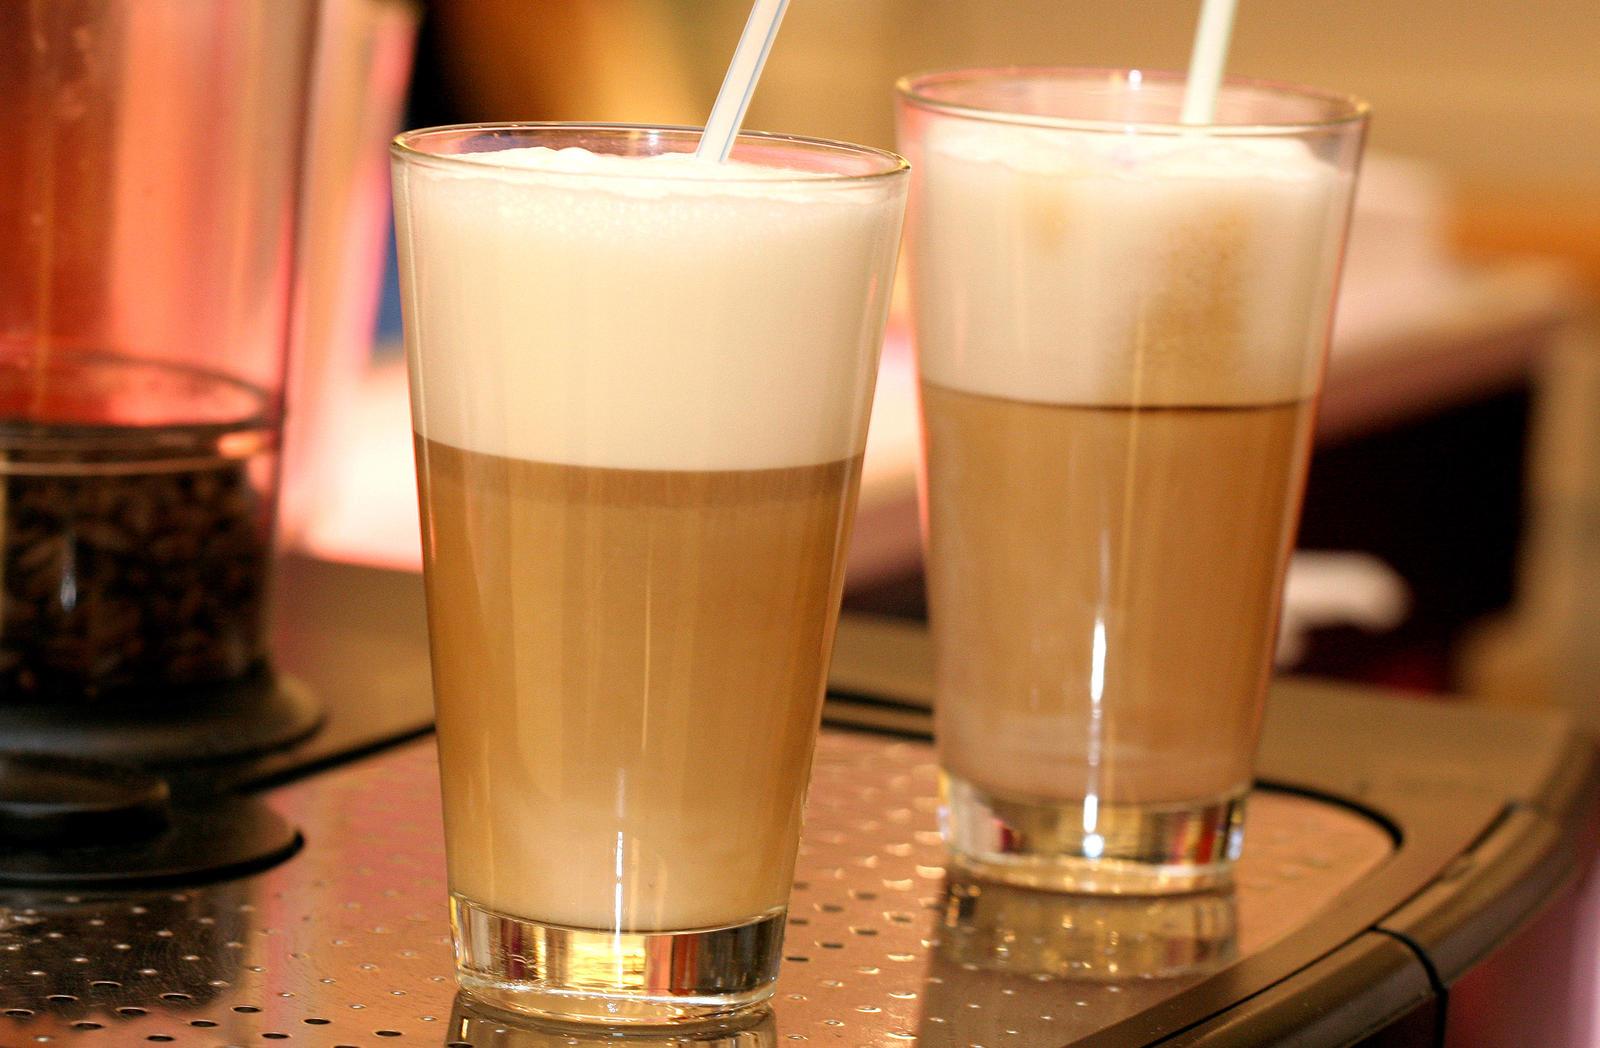 Third Wave Kaffee